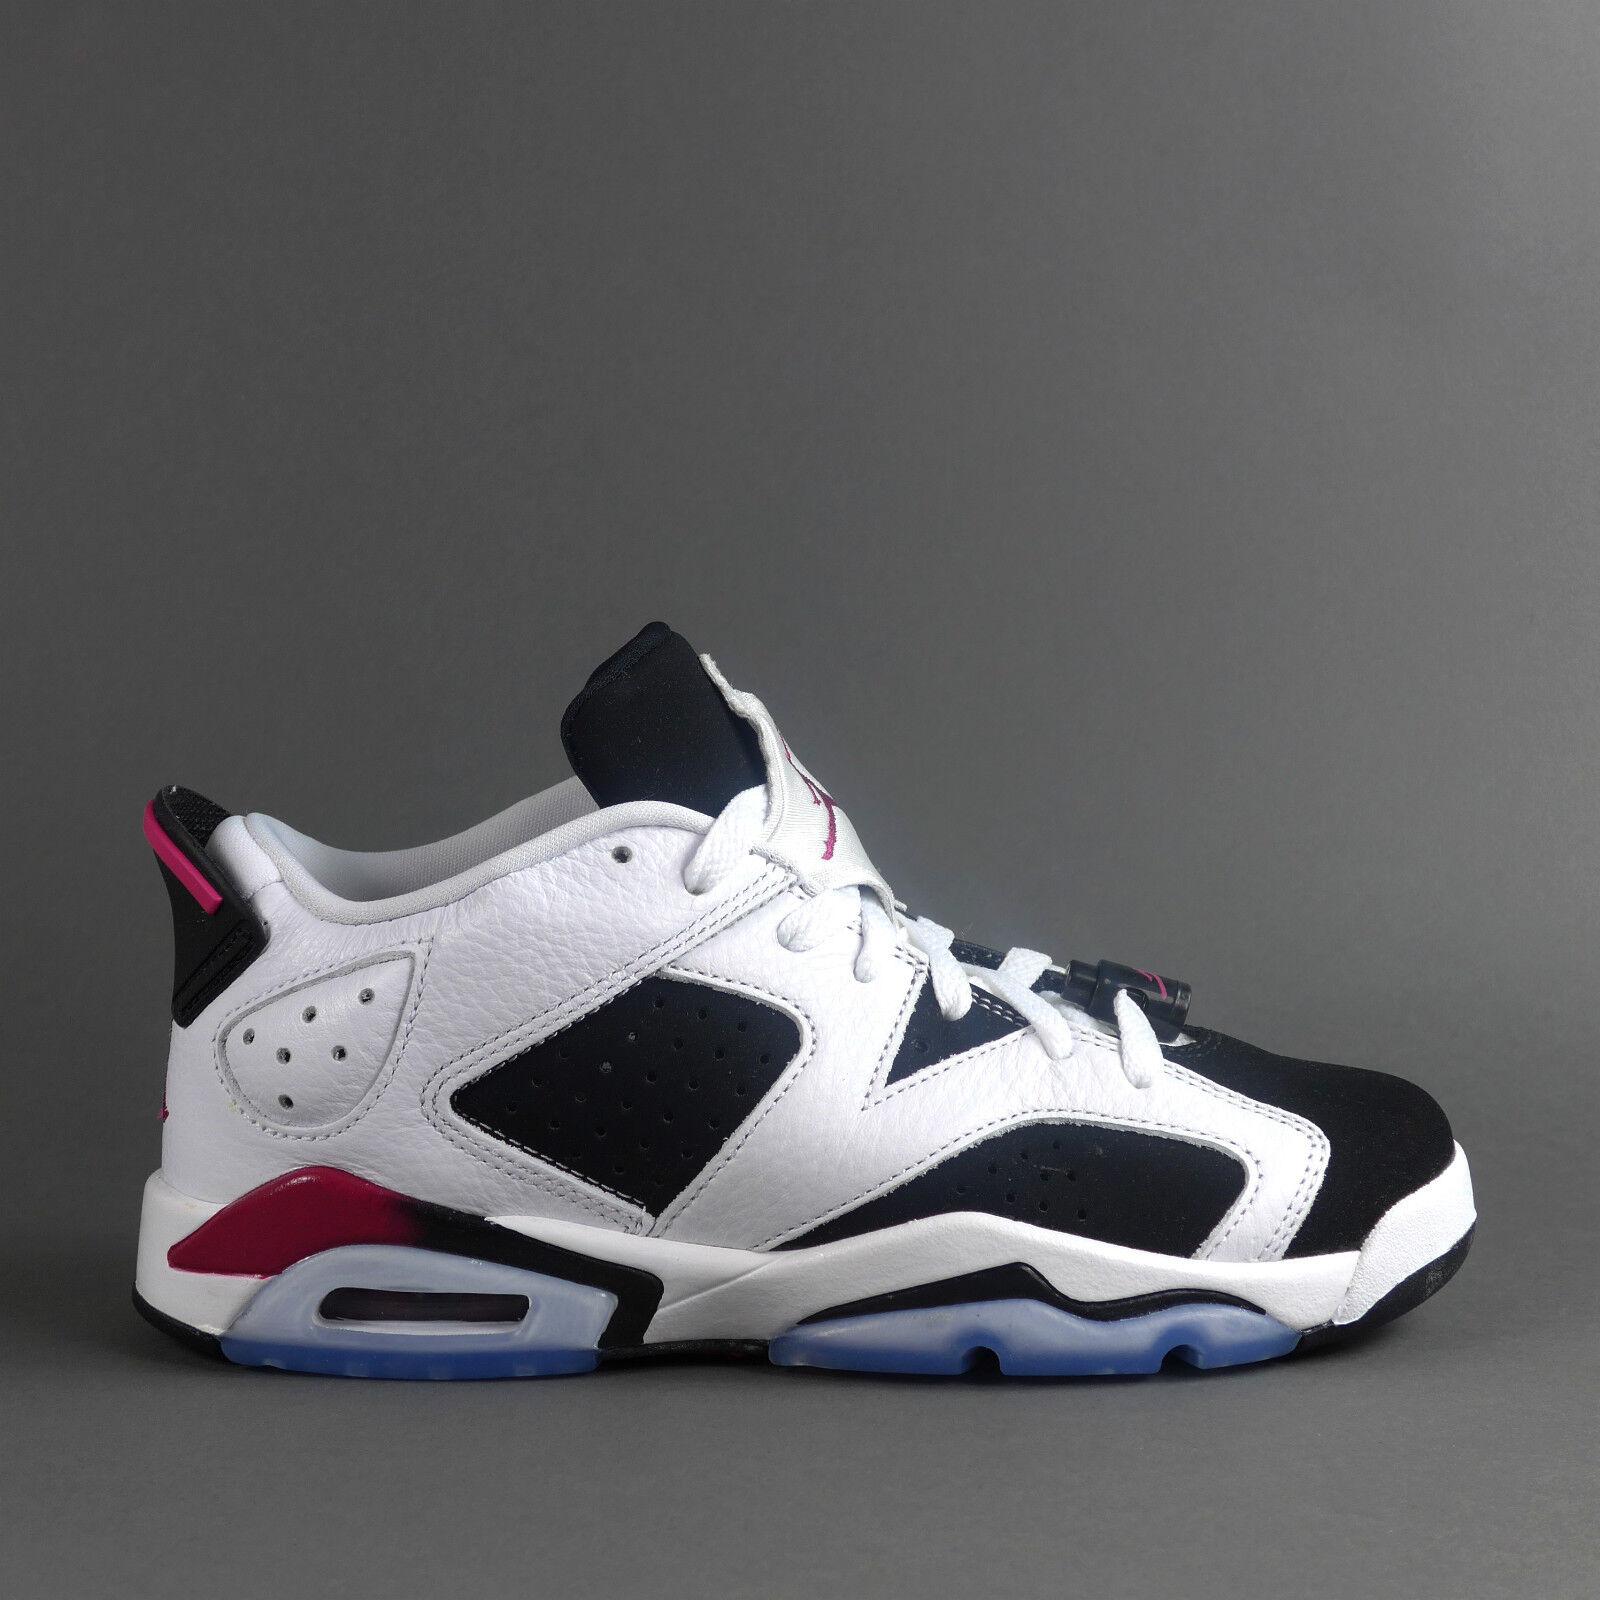 Nike Air Jordan 6 RETRO LOW GG GG GG Scarpe Basket 107 NBA Bambini   05025f